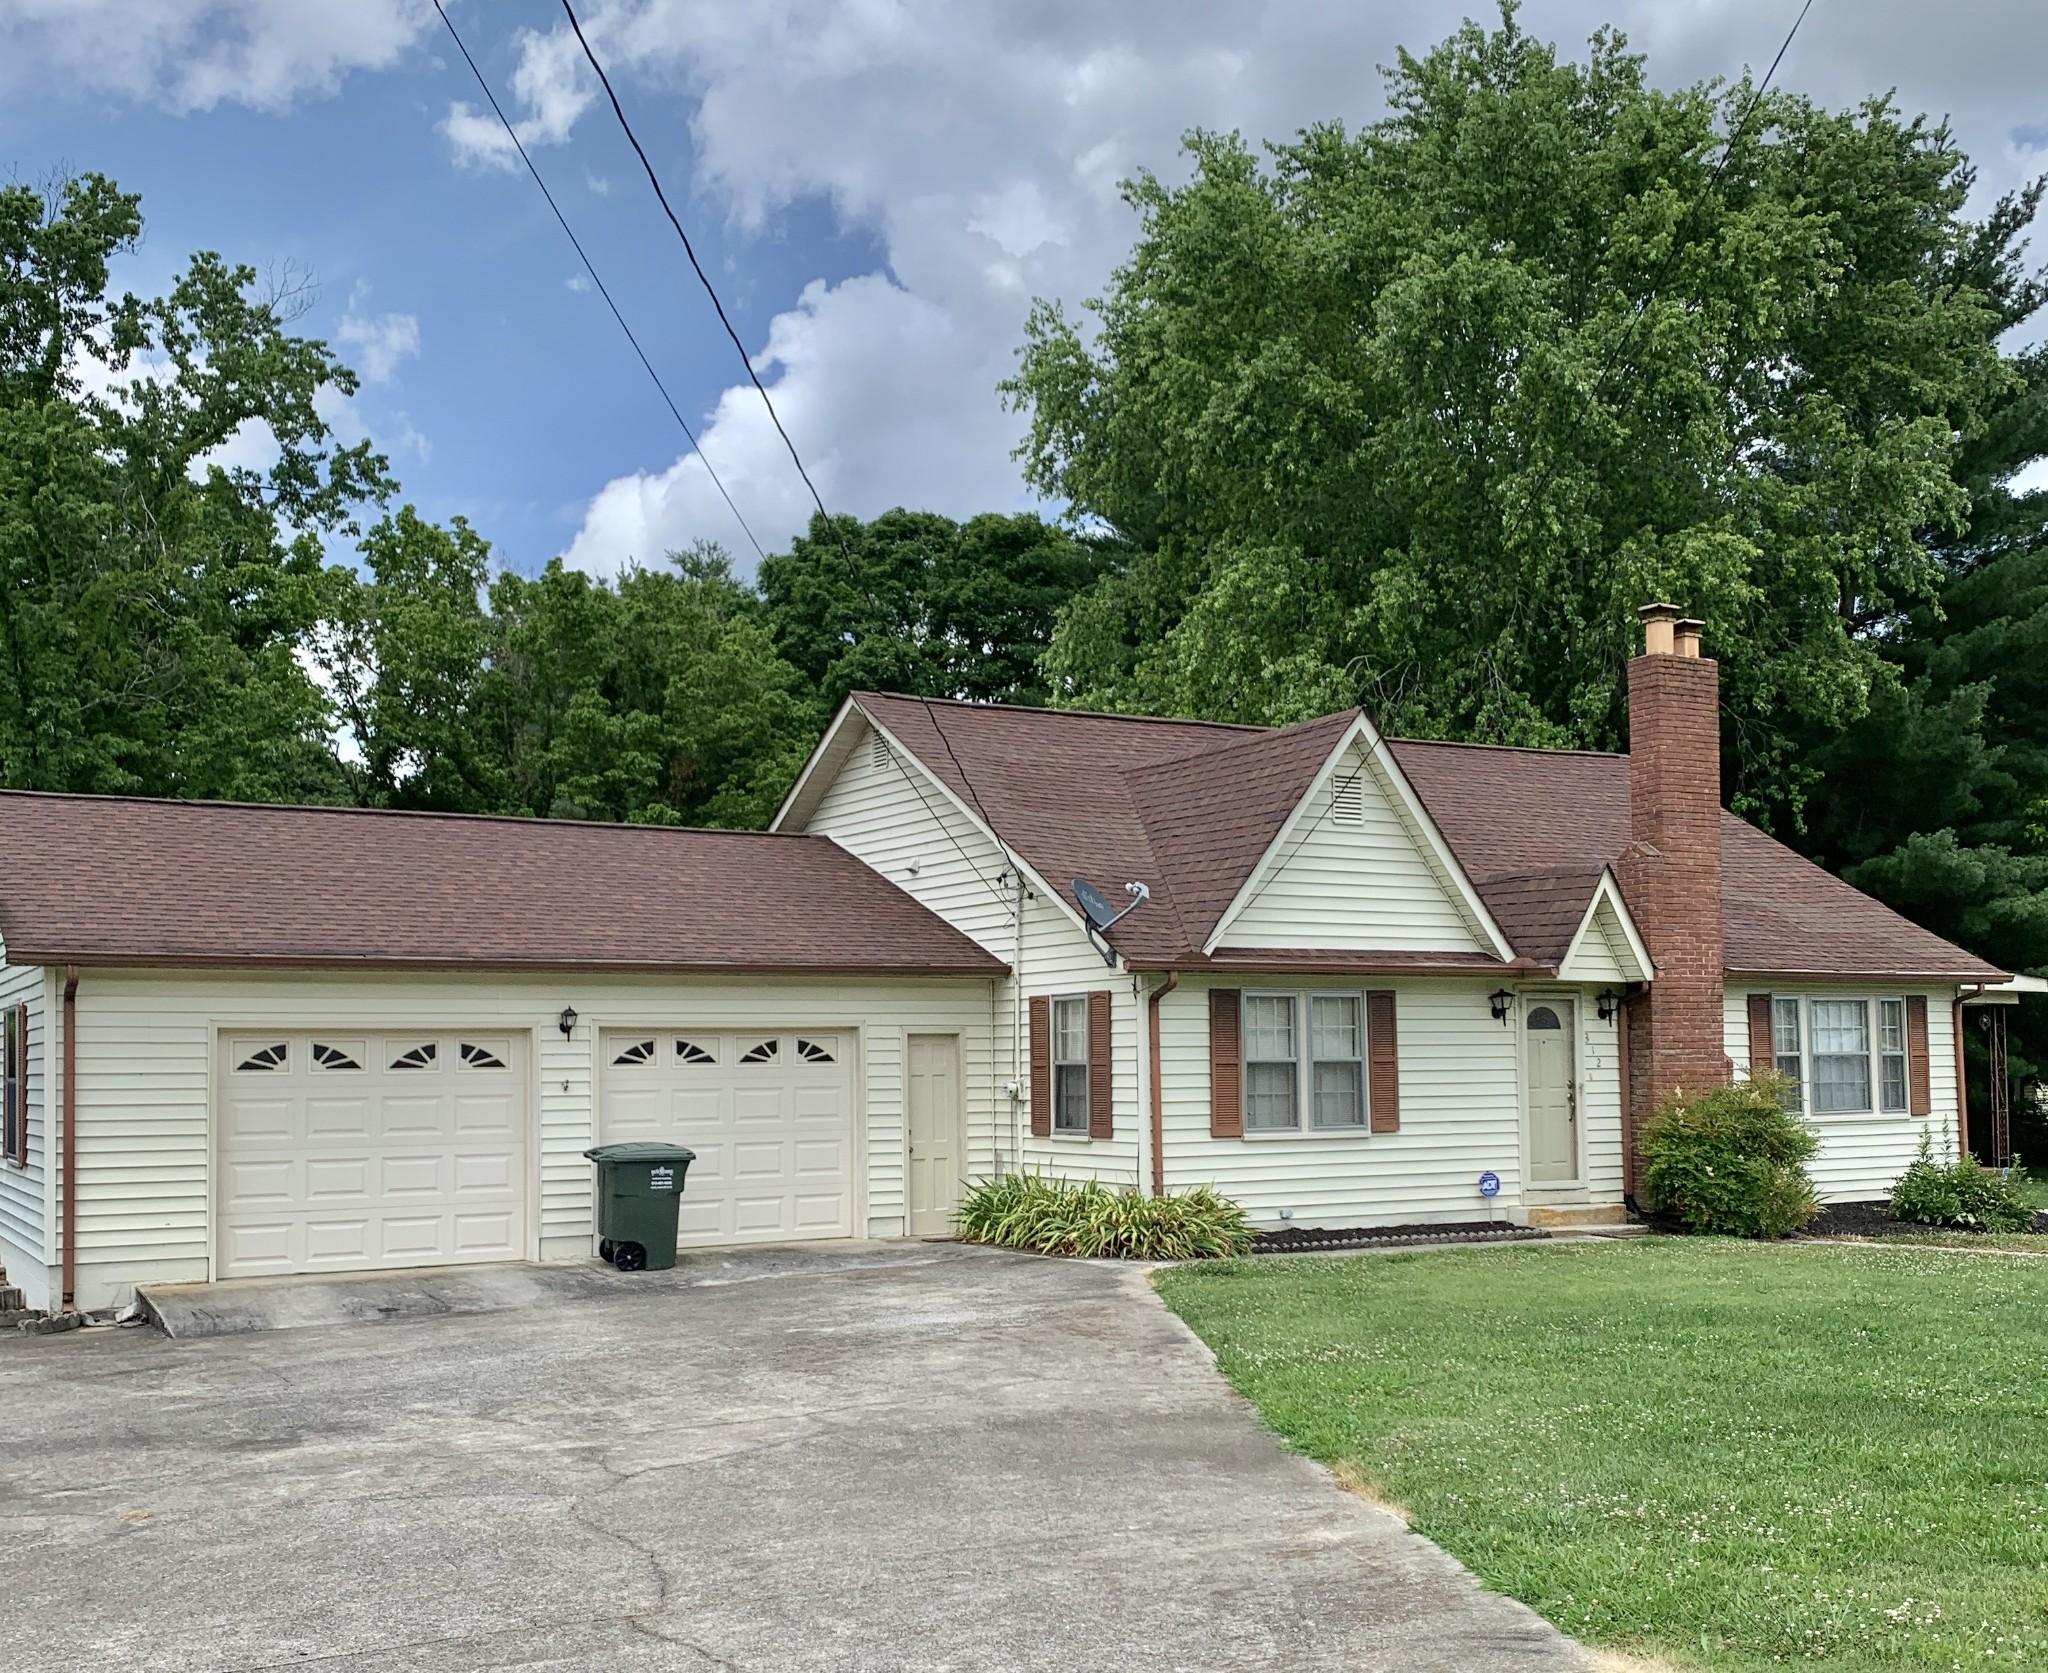 312 W Main St Property Photo - Alexandria, TN real estate listing